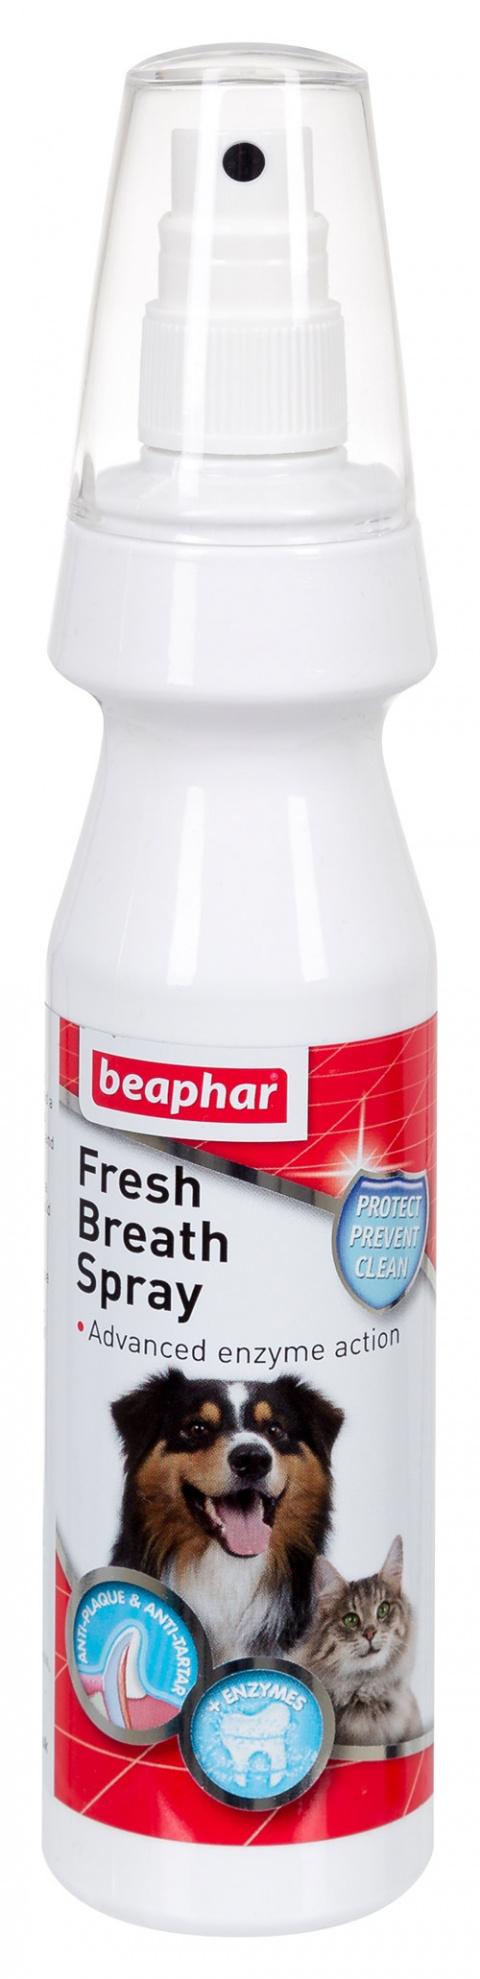 Sprej pro svěží dech Beaphar Fresh Breath 150ml